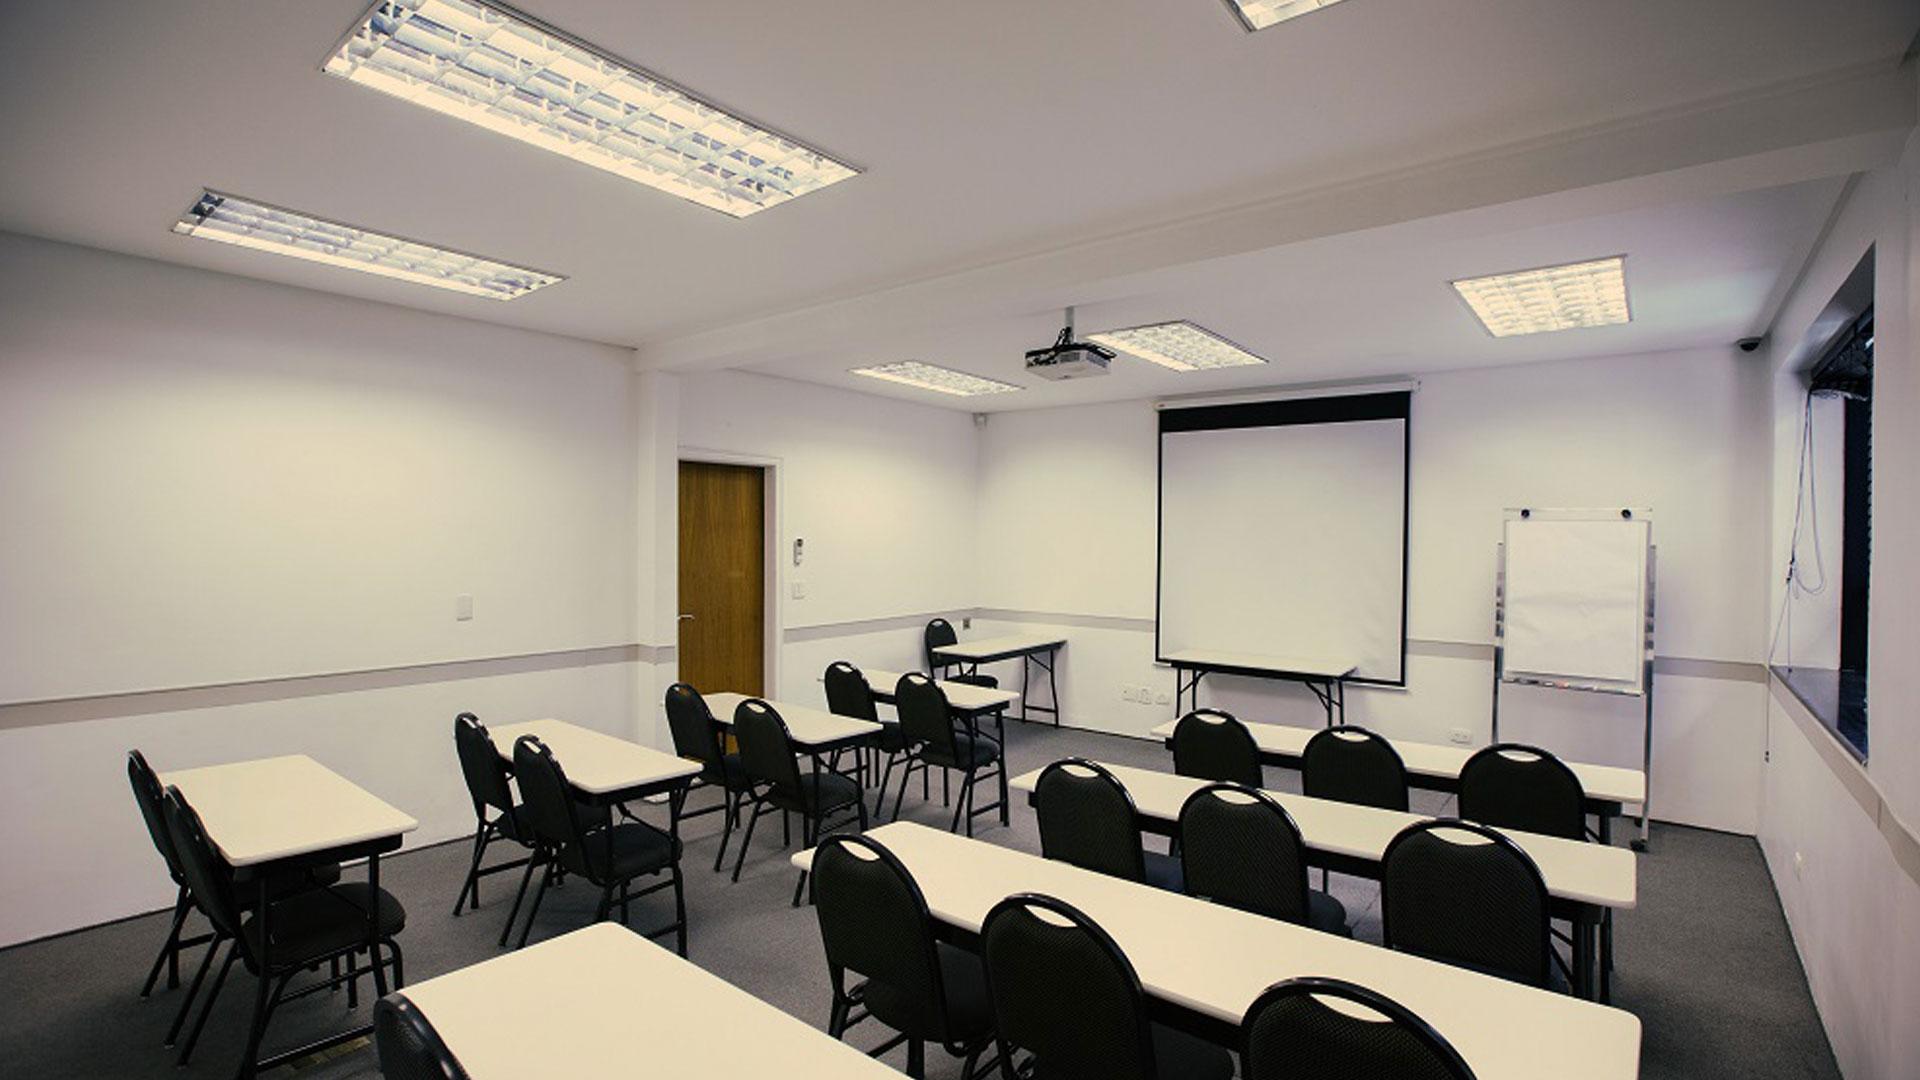 sala-1-formato-escolar